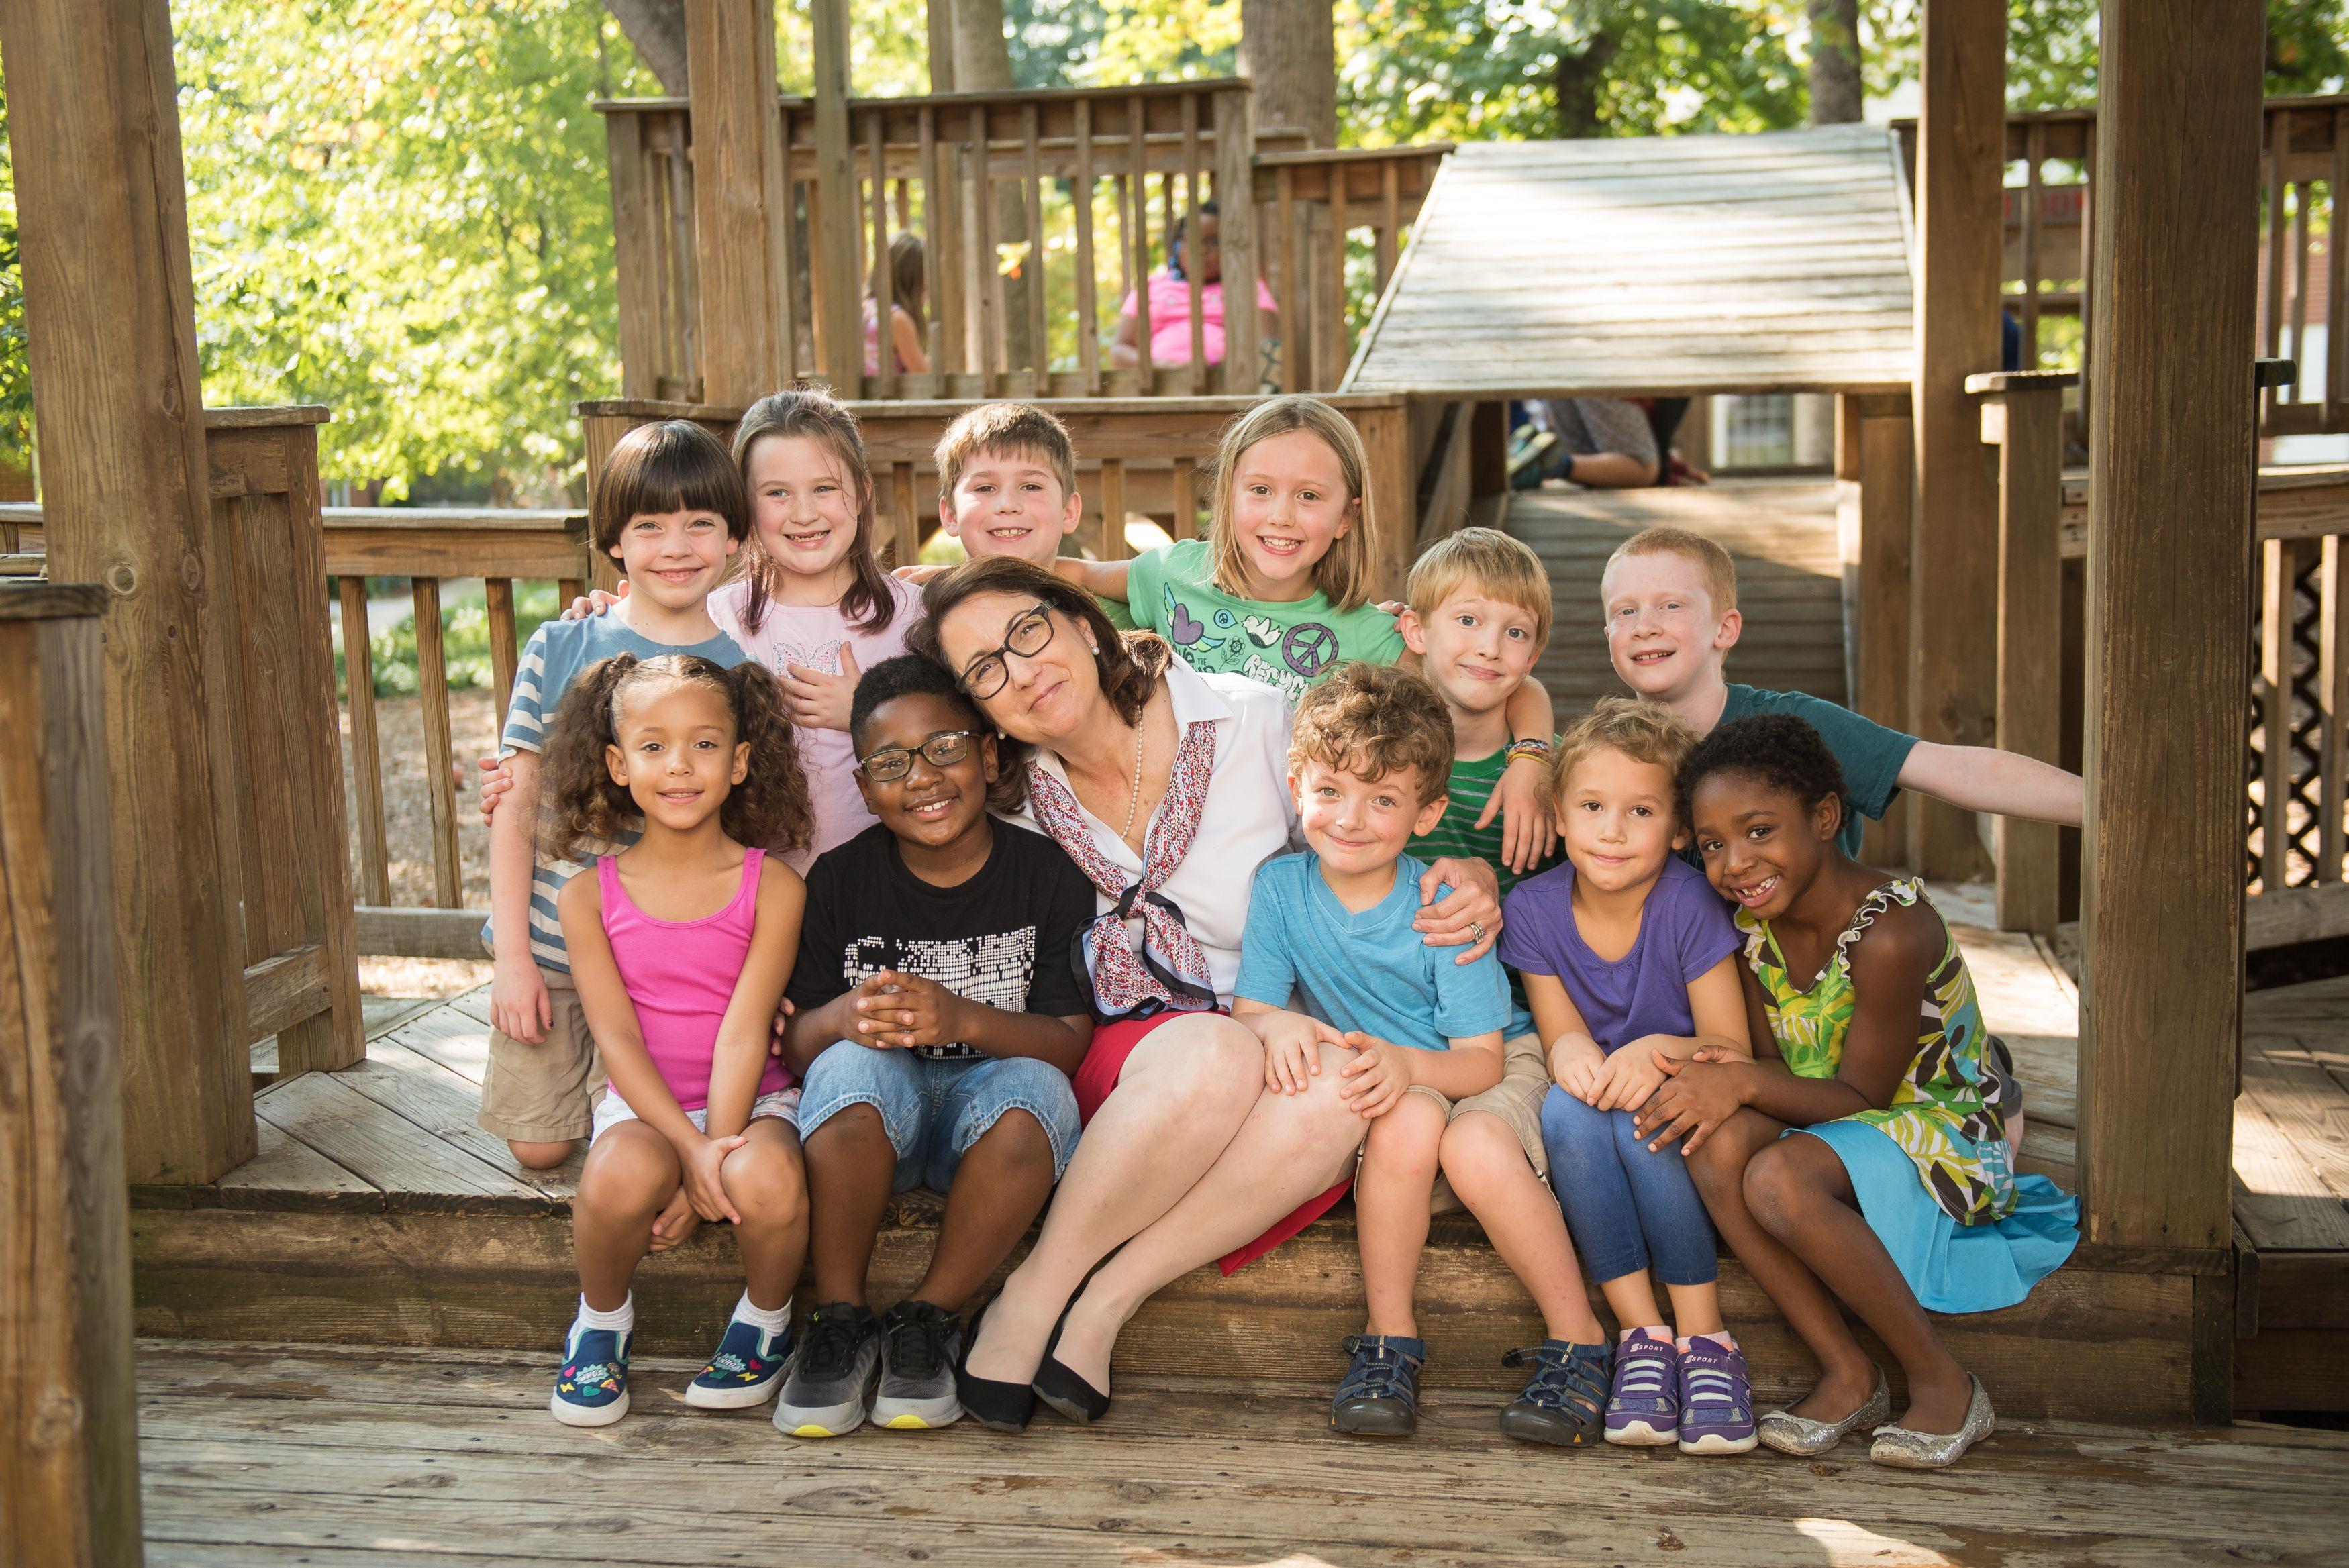 Welcome to NGFS - New Garden Friends School